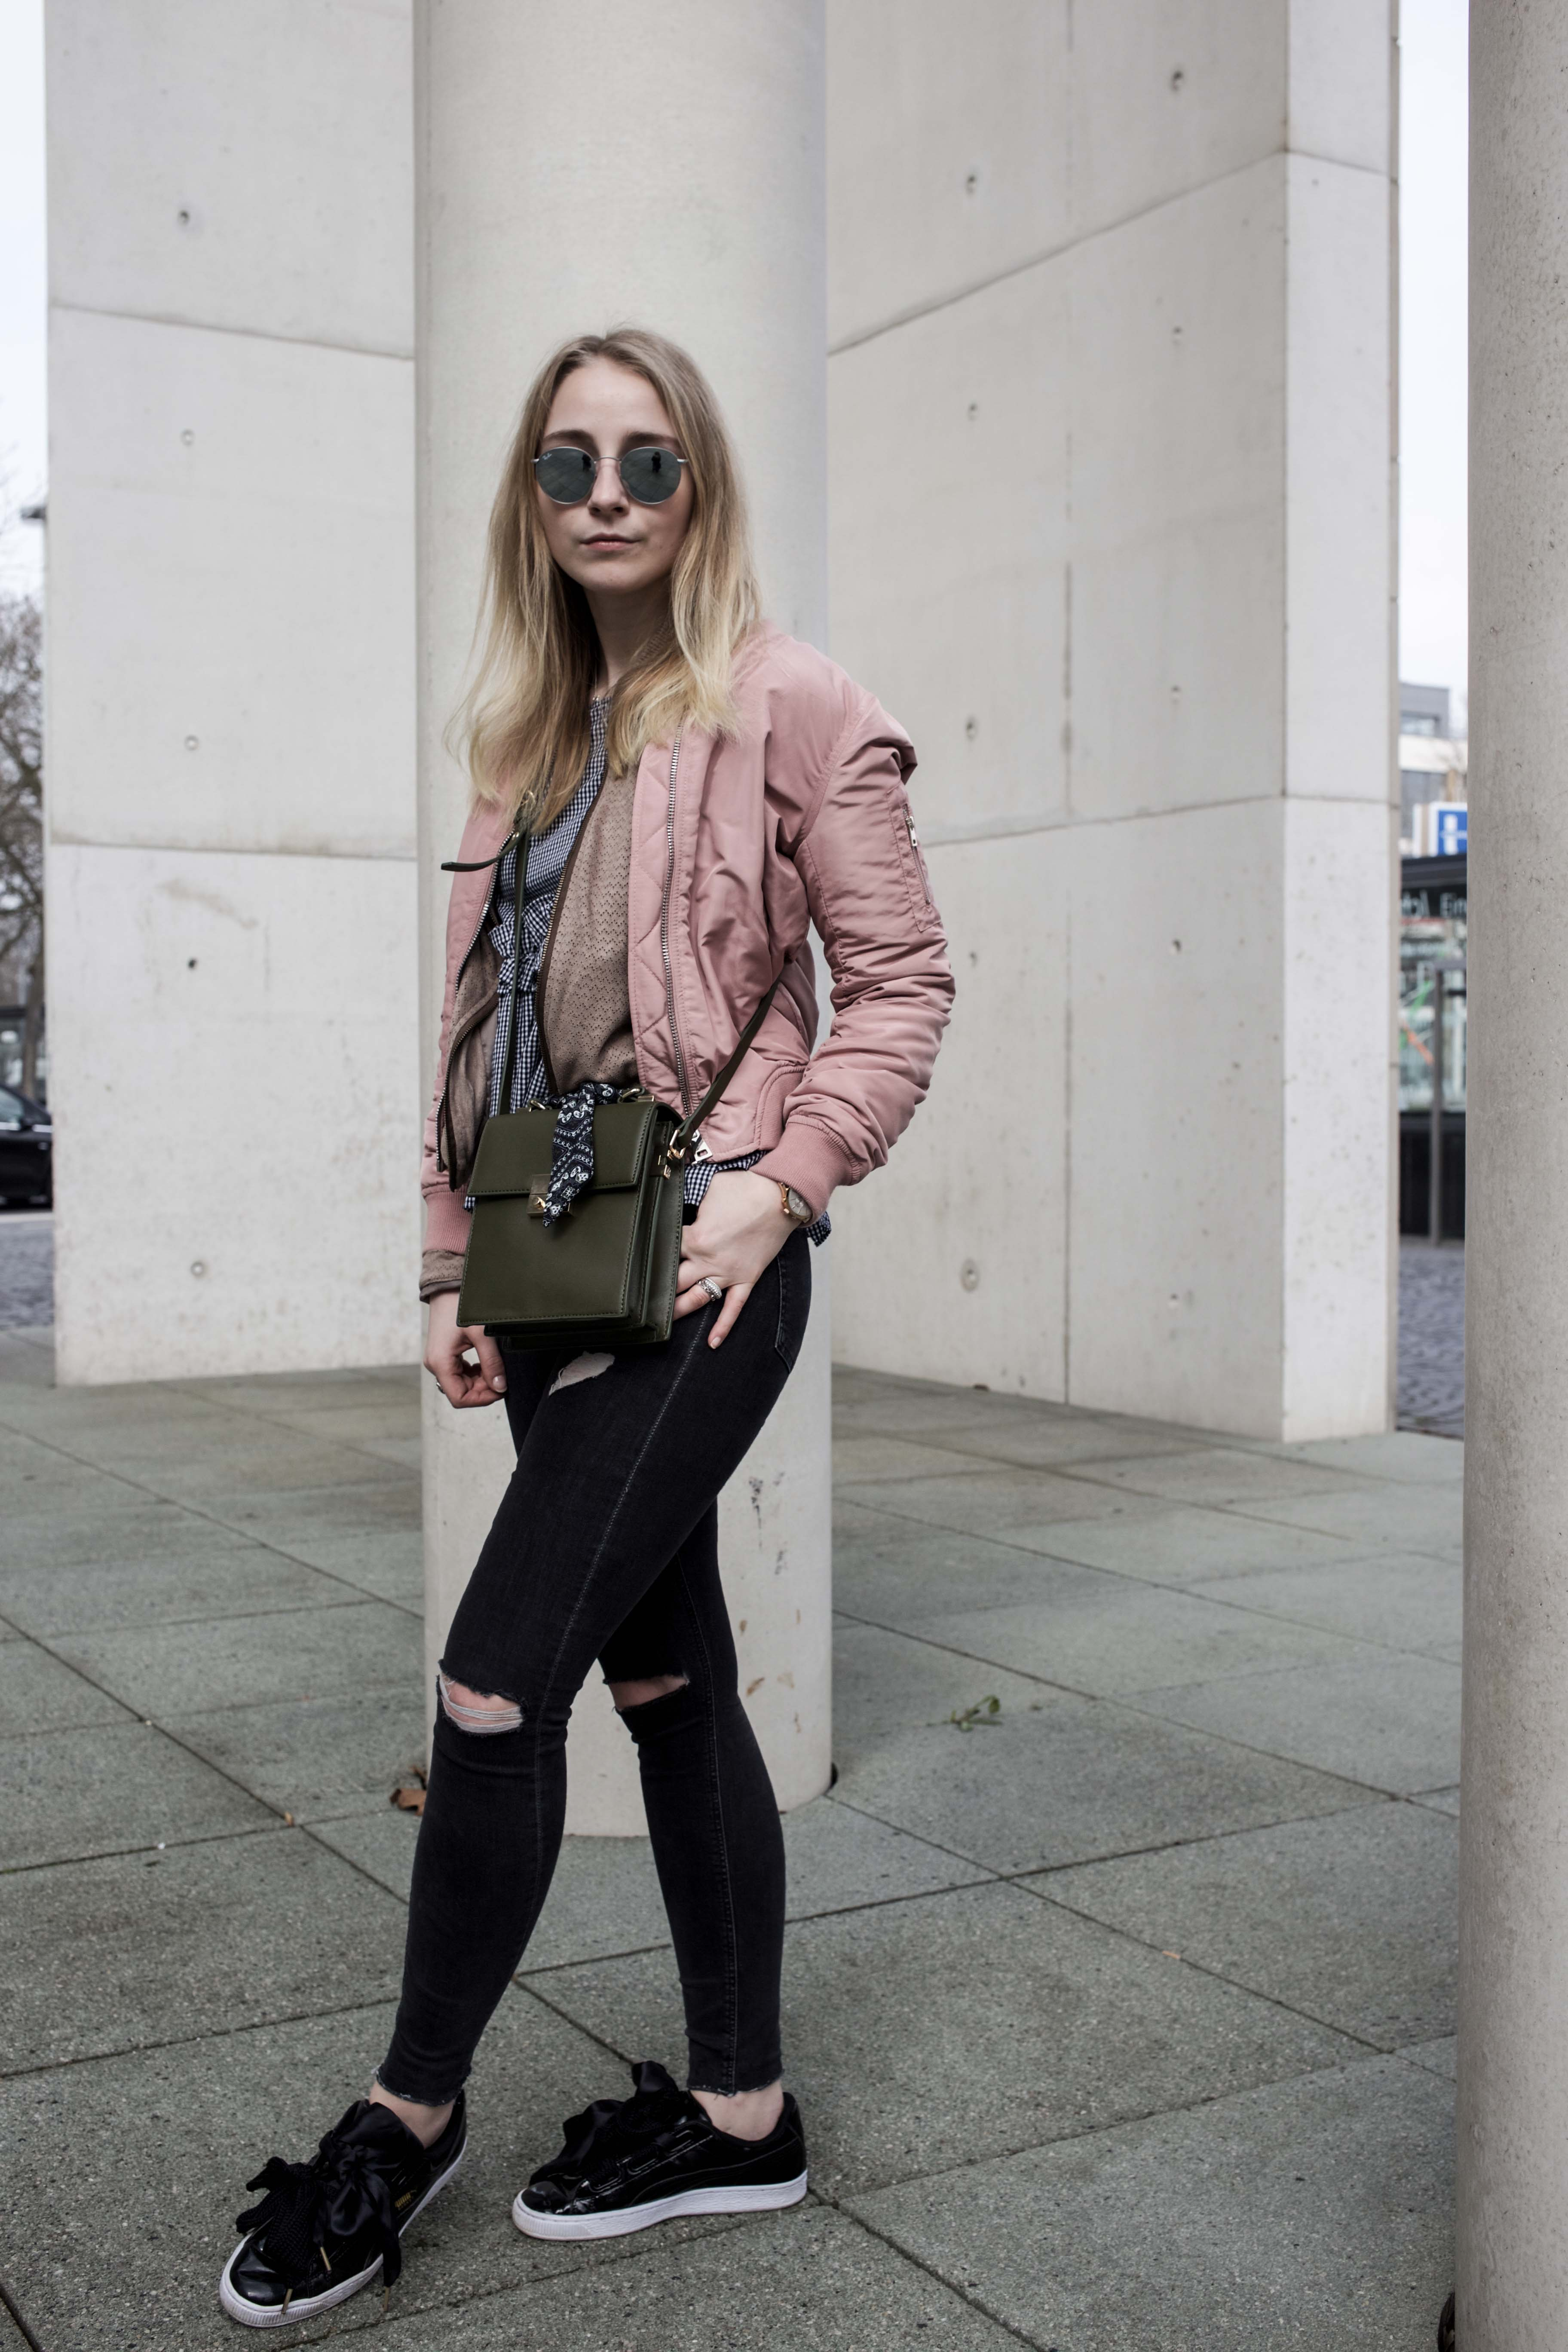 trendreport-ray-ban-round-metal-vichy-karo-frühlingslook-fashionblog-modeblog_4778